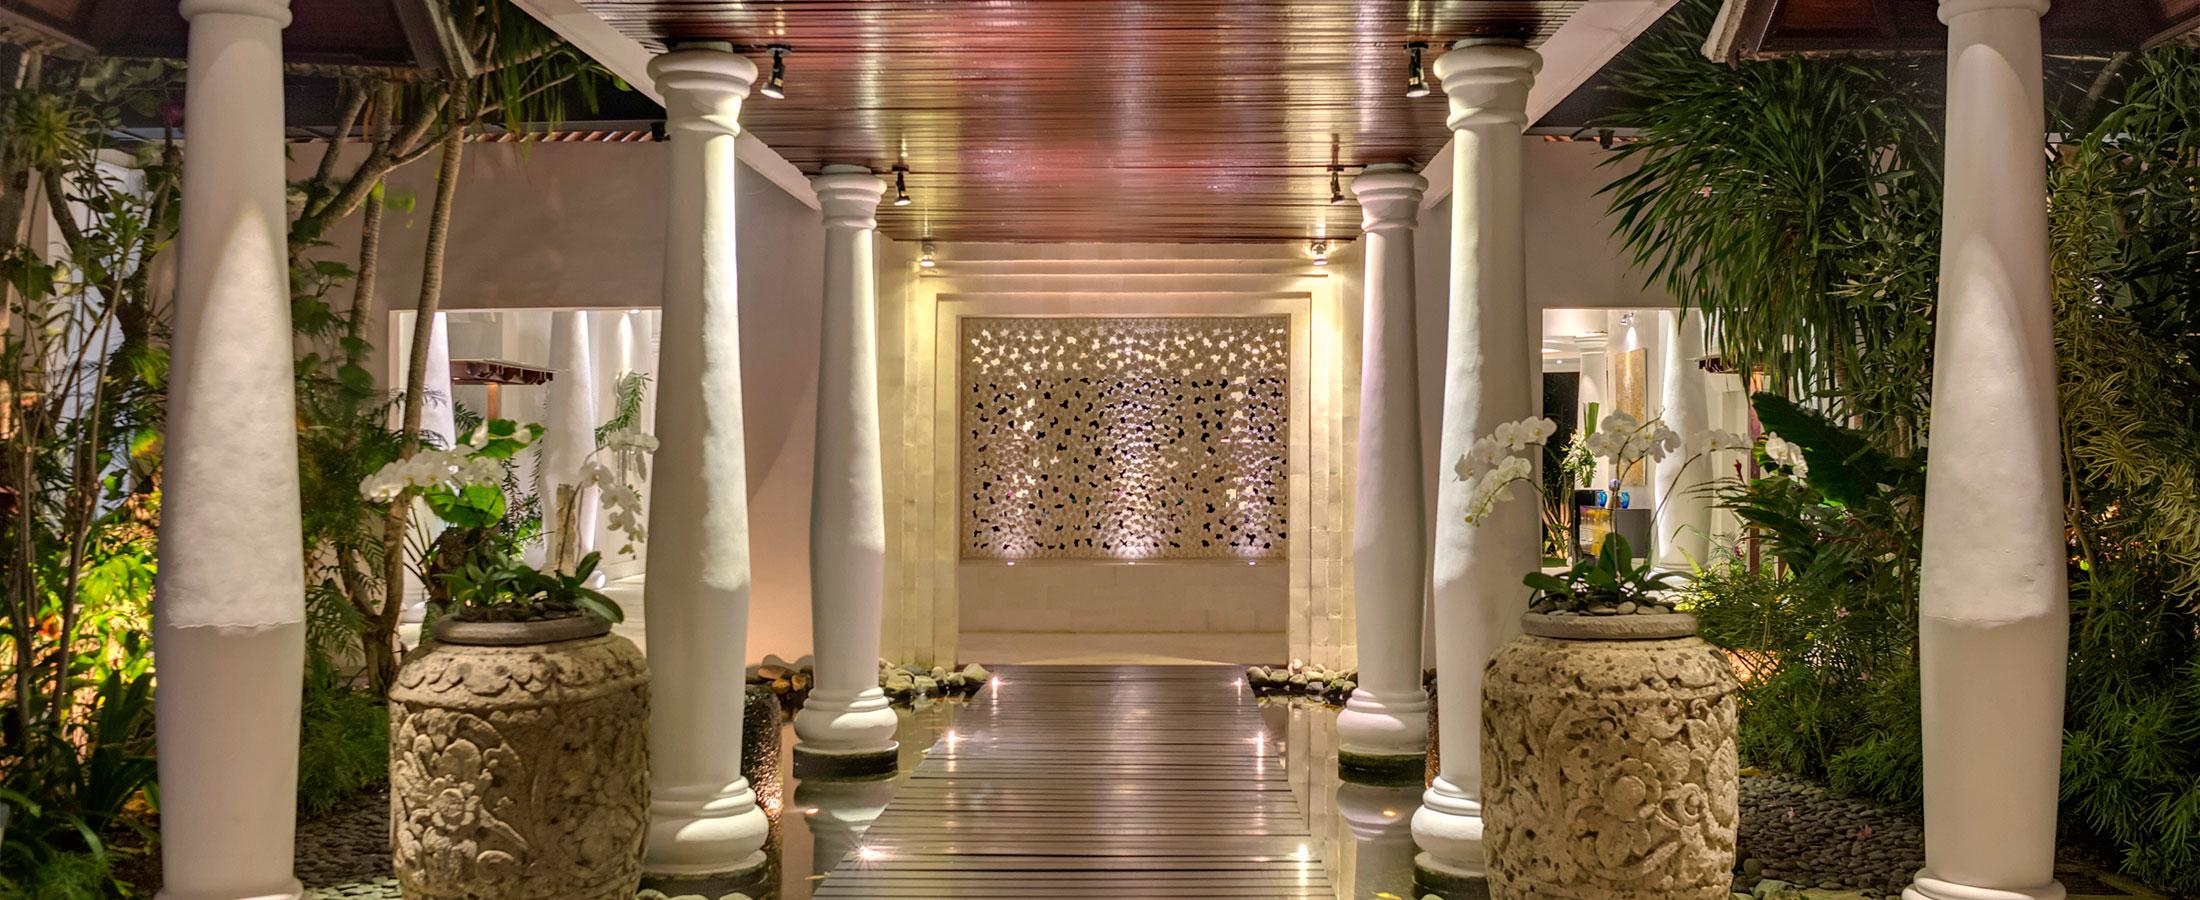 Inside the Estate